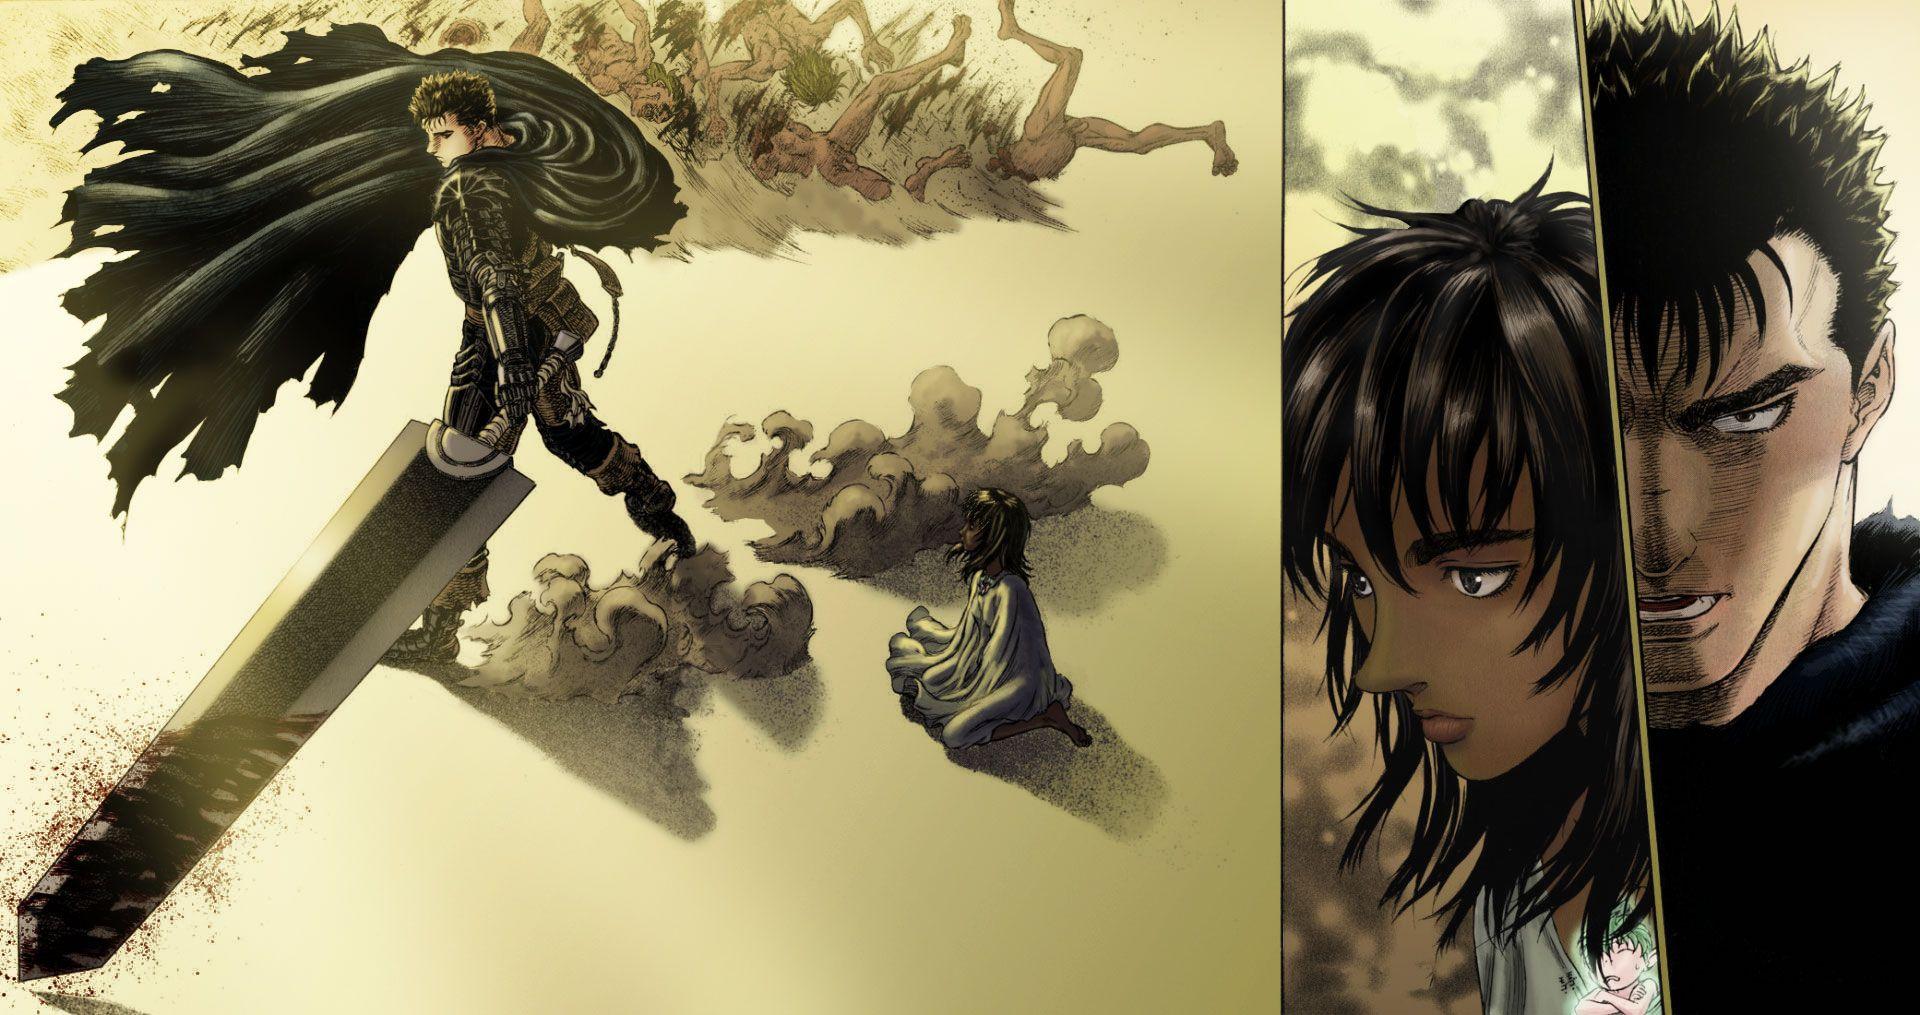 BERSERK (Kentaro Miura), Casca, Guts, The Dragonslayer